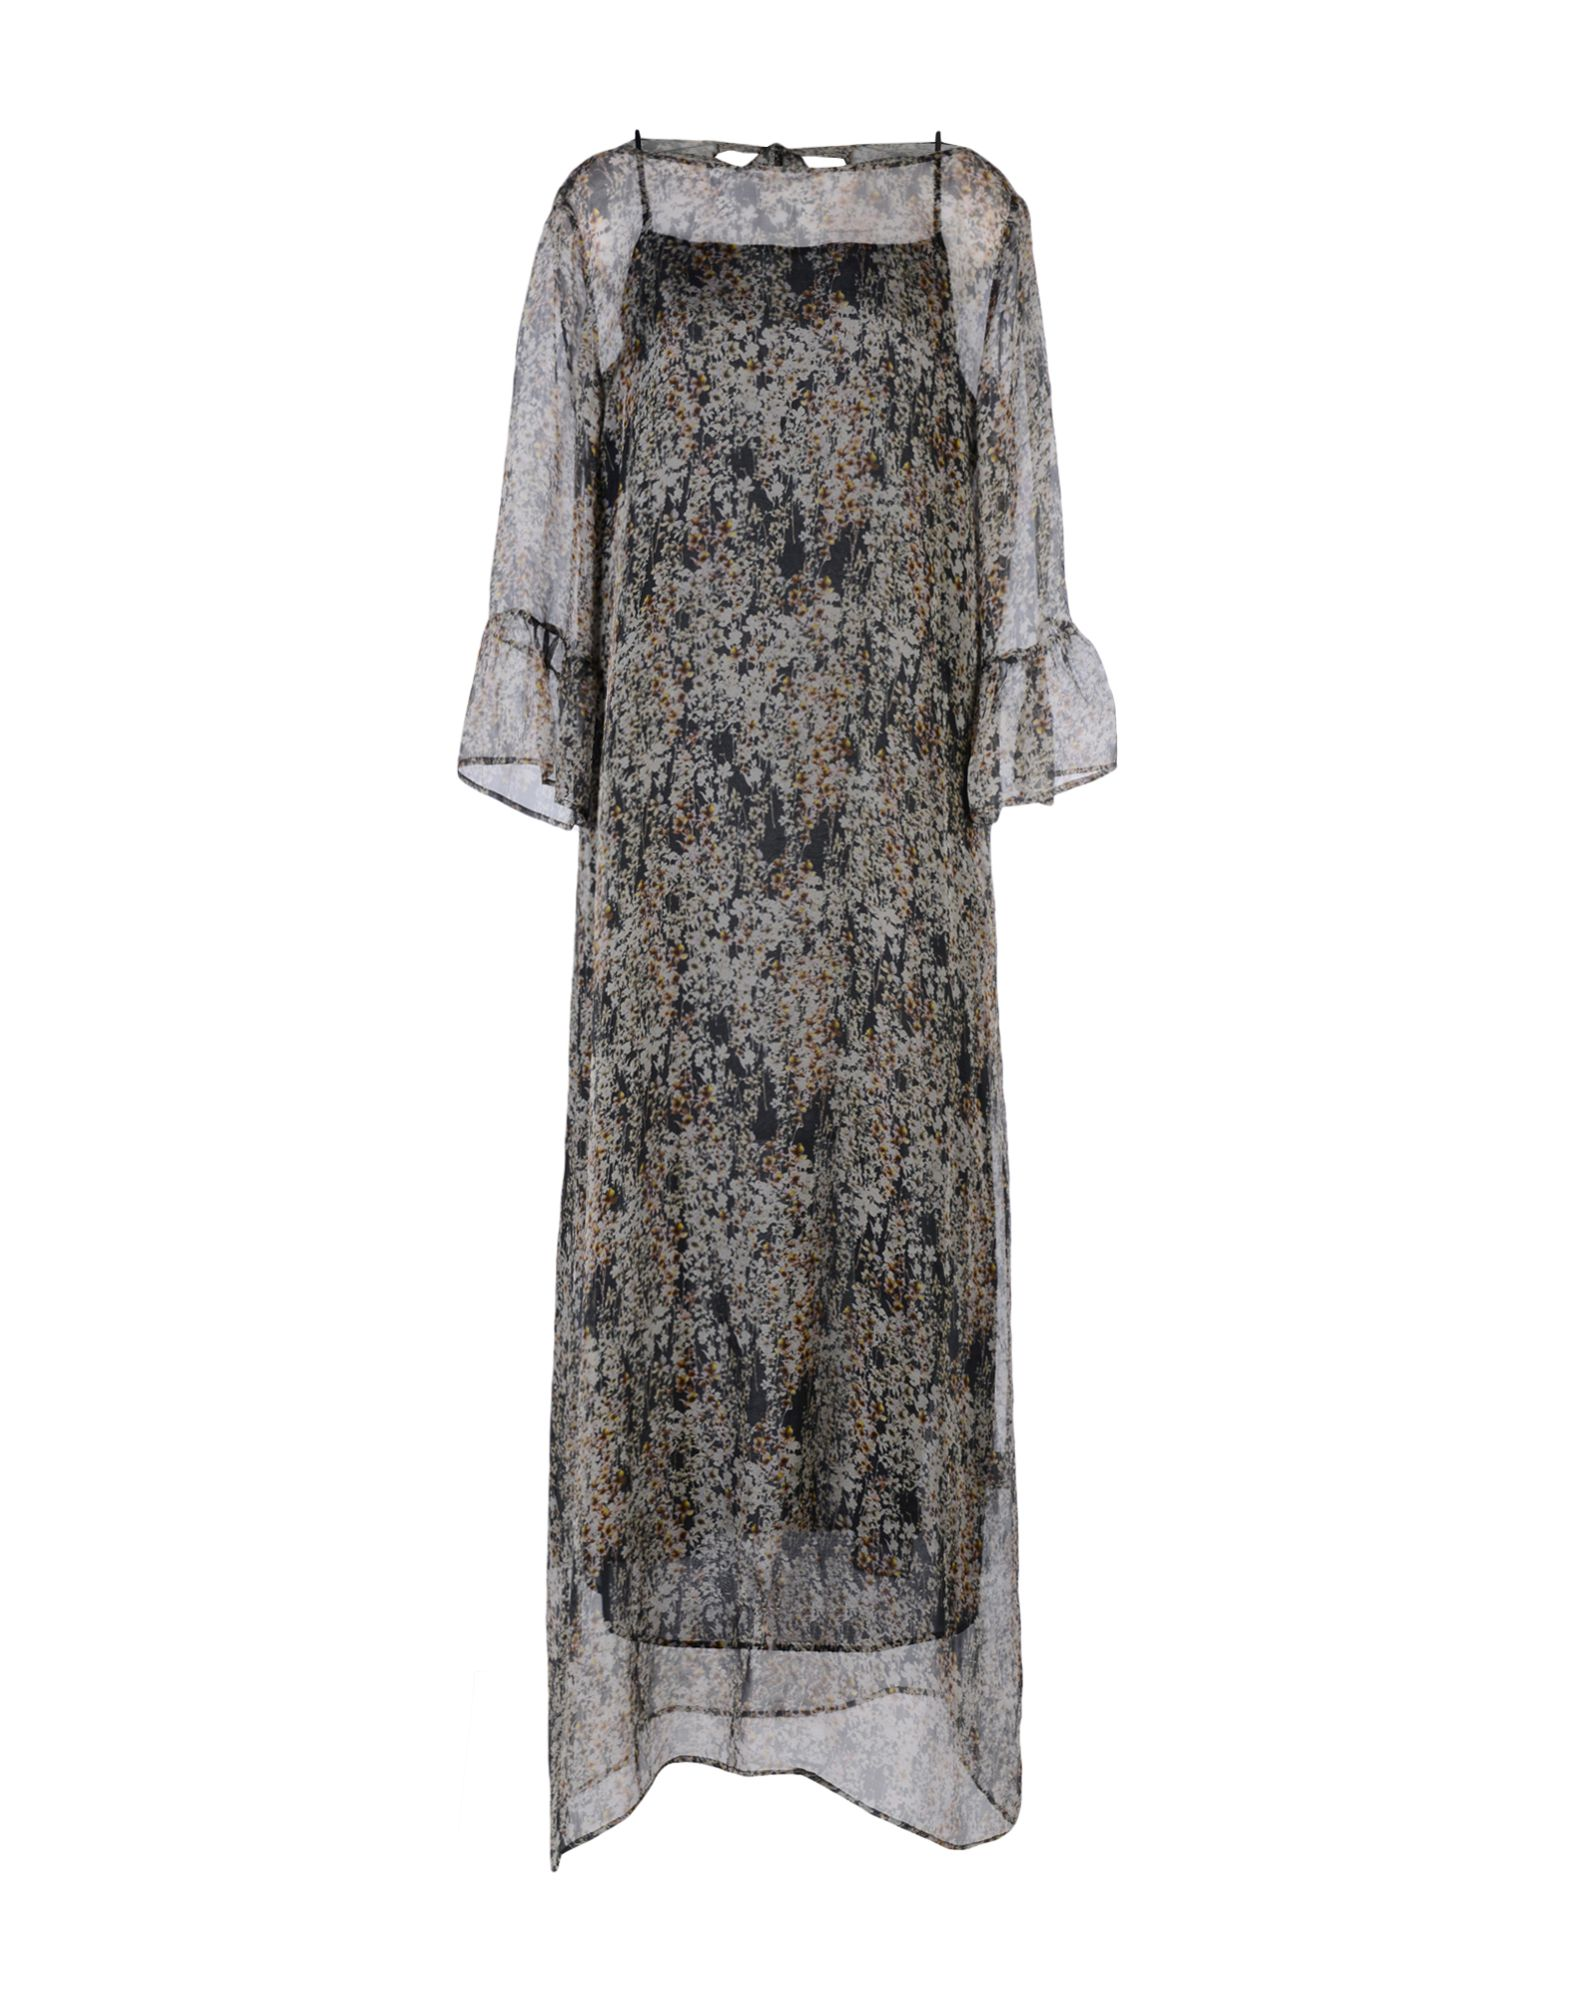 ZHELDA Платье длиной 3/4 lisa corti платье длиной 3 4